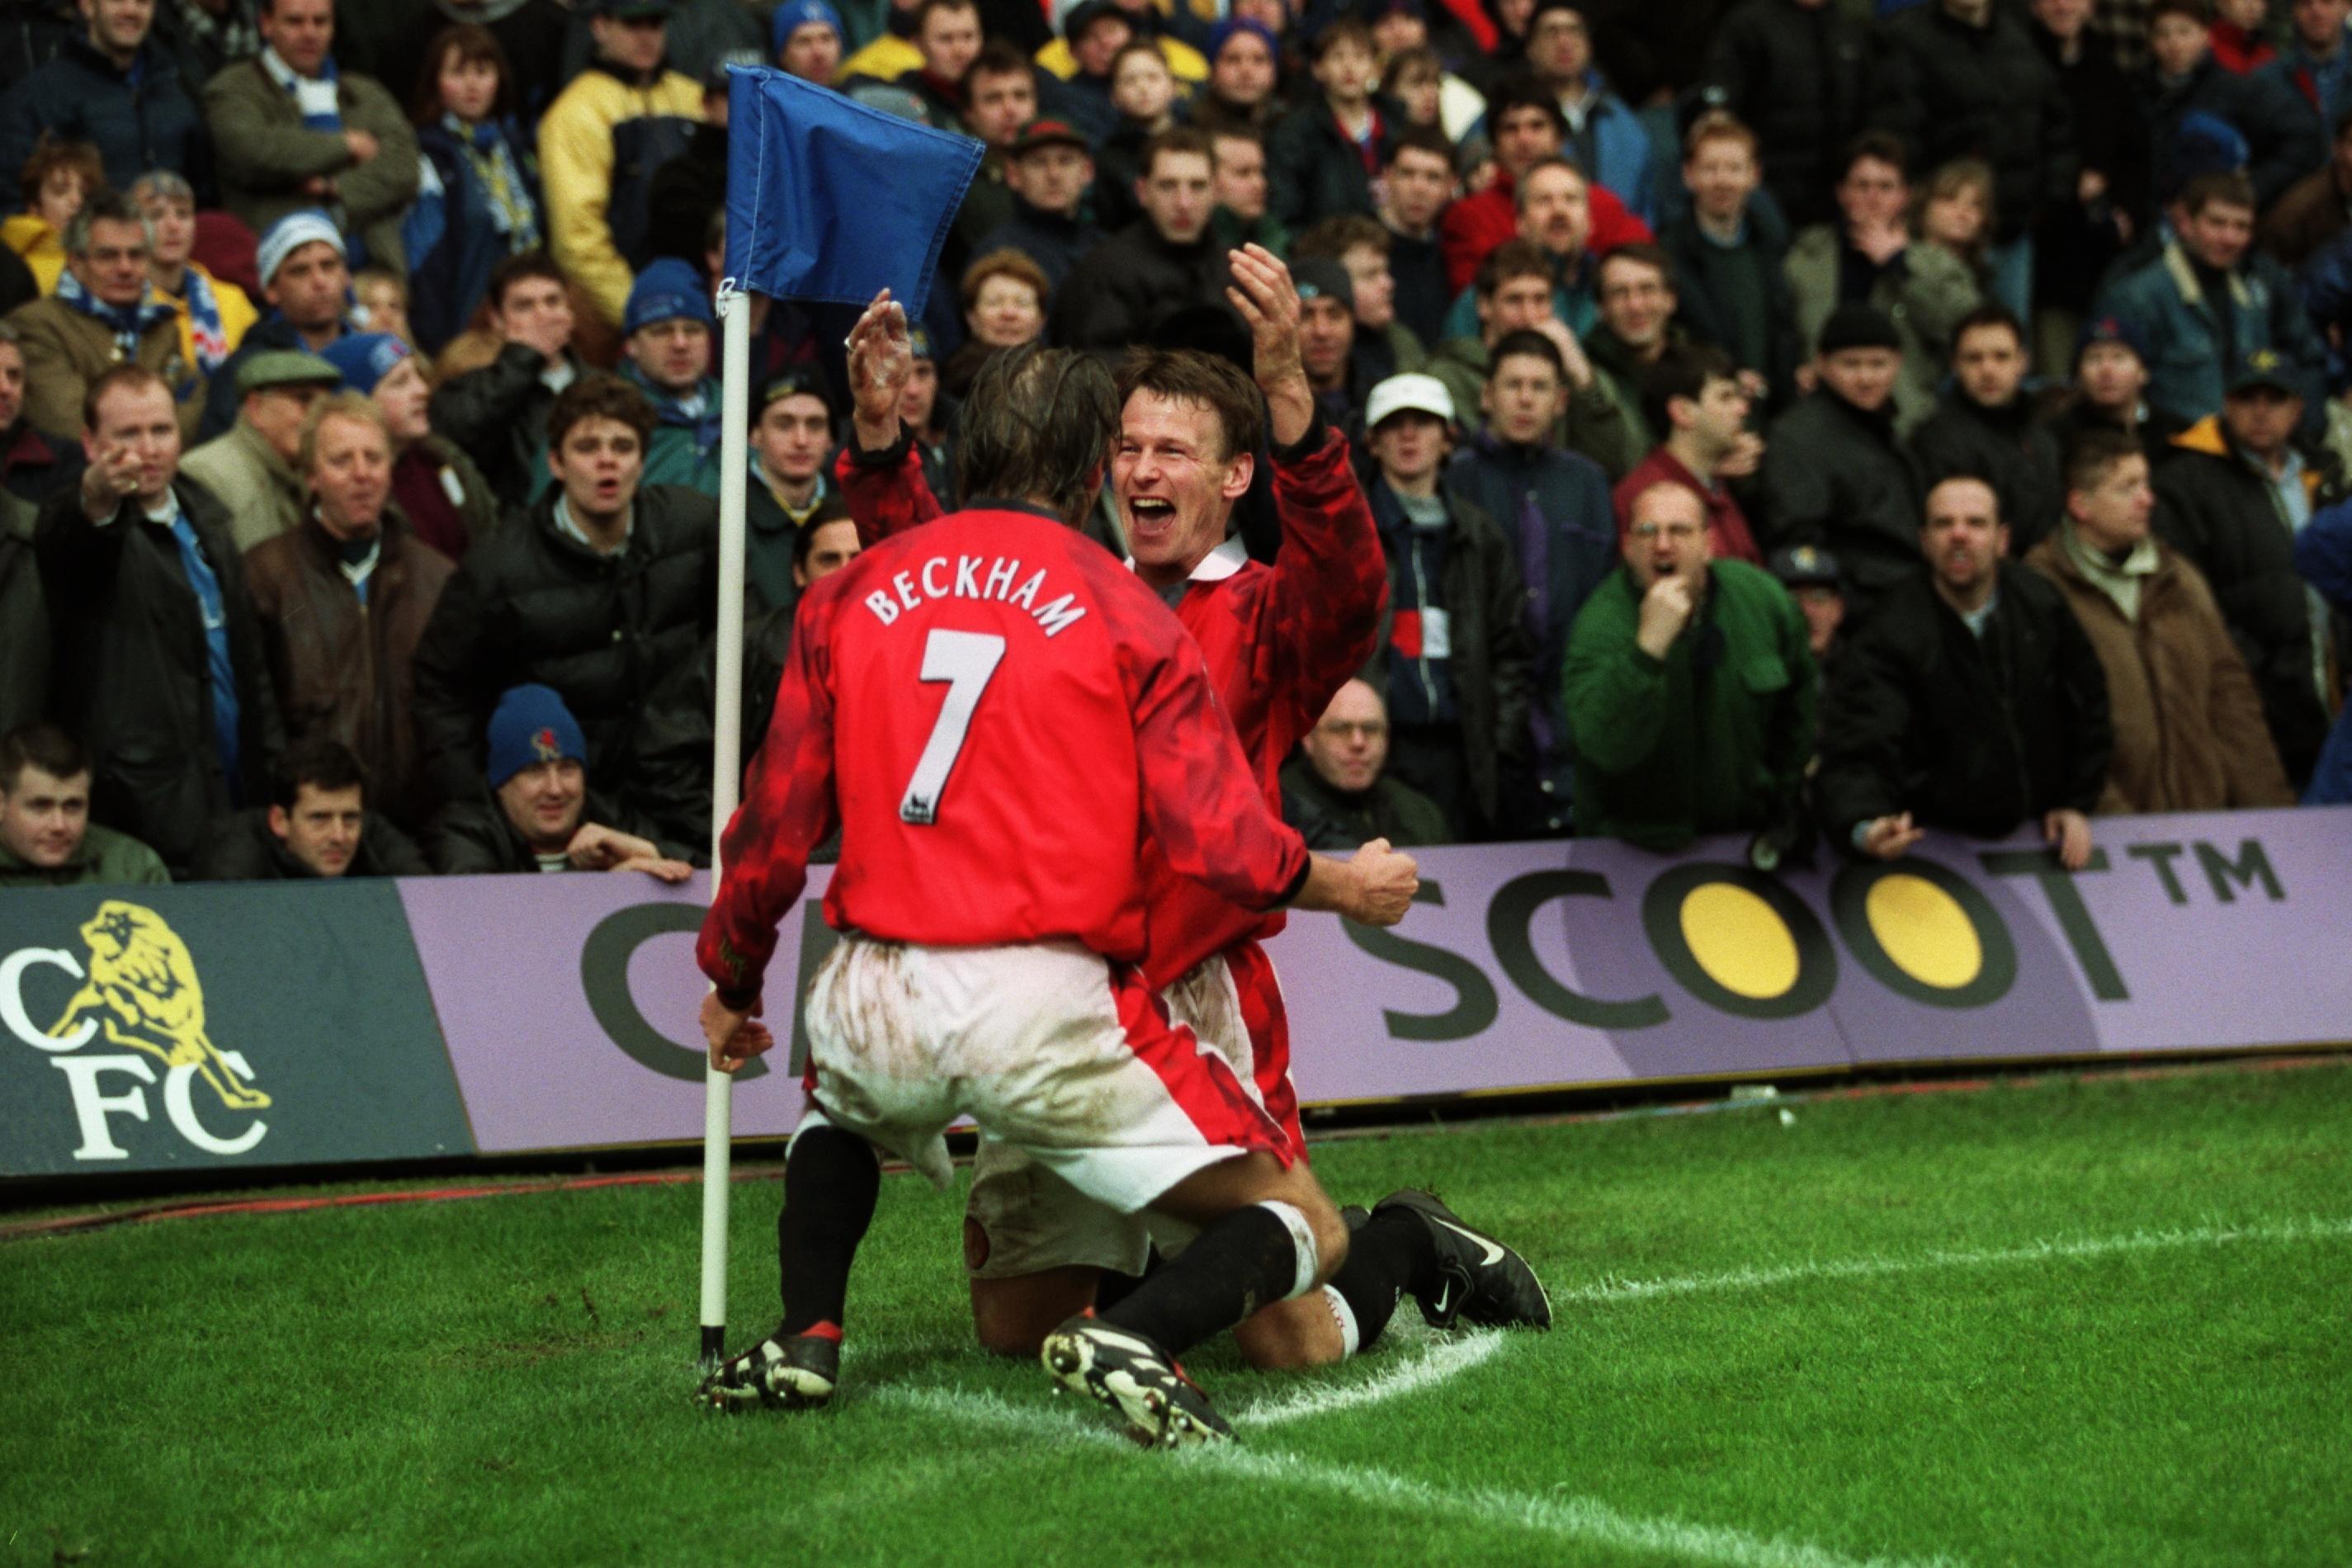 David Beckham Number 7